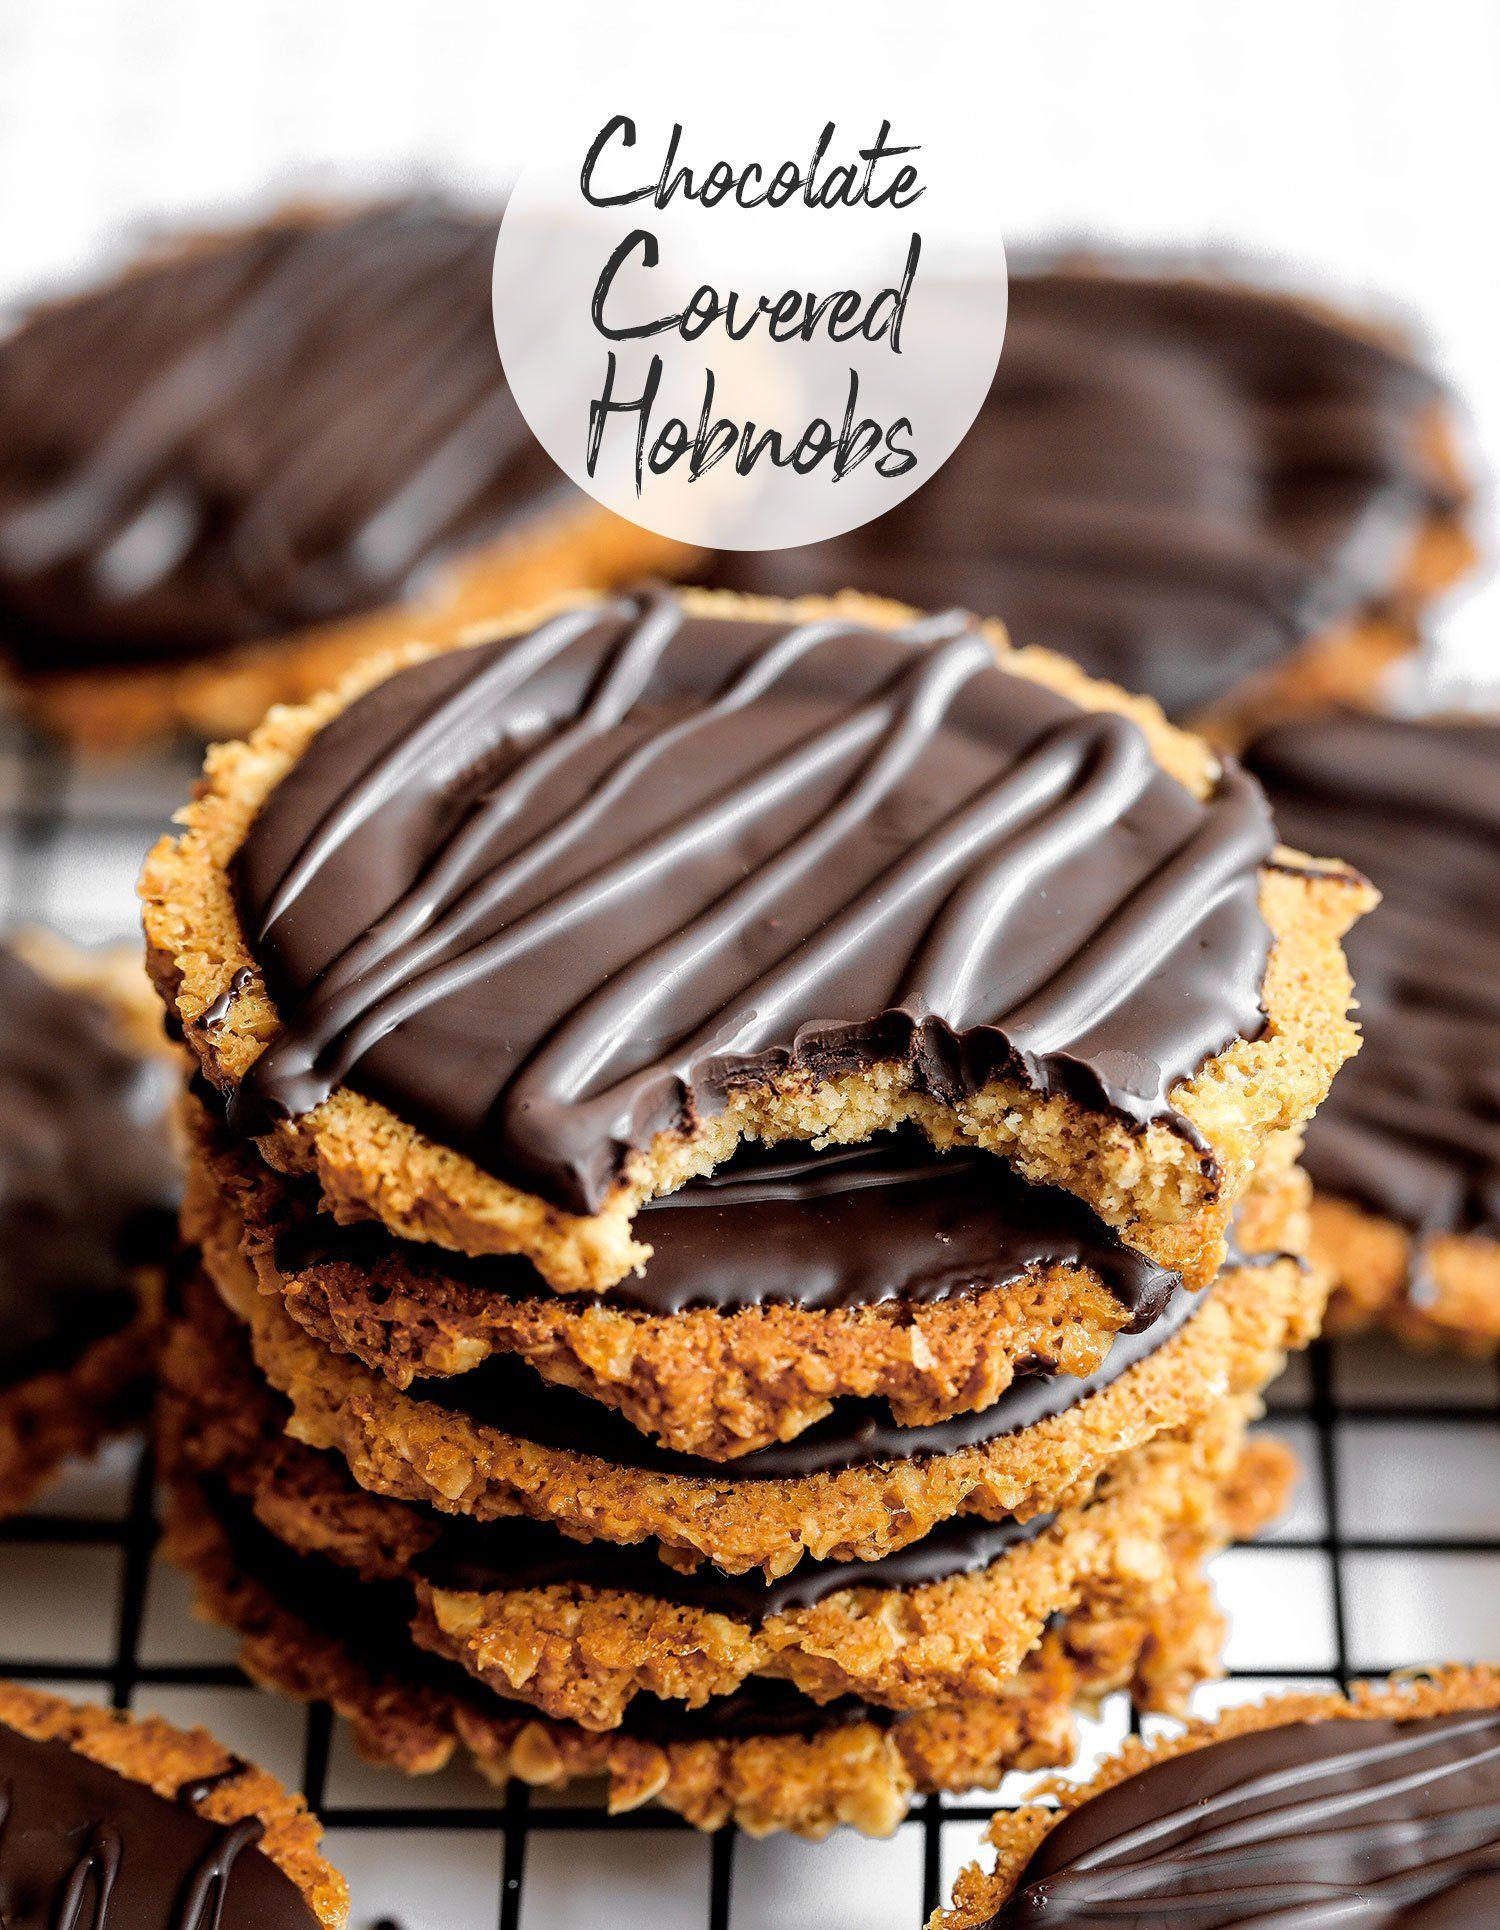 Homemade Chocolate Hobnobs Vegan Gluten Free Uk Health Blog Nadia S Healthy Kitchen Recipe Homemade Chocolate Chocolate Digestive Biscuits Digestive Biscuits